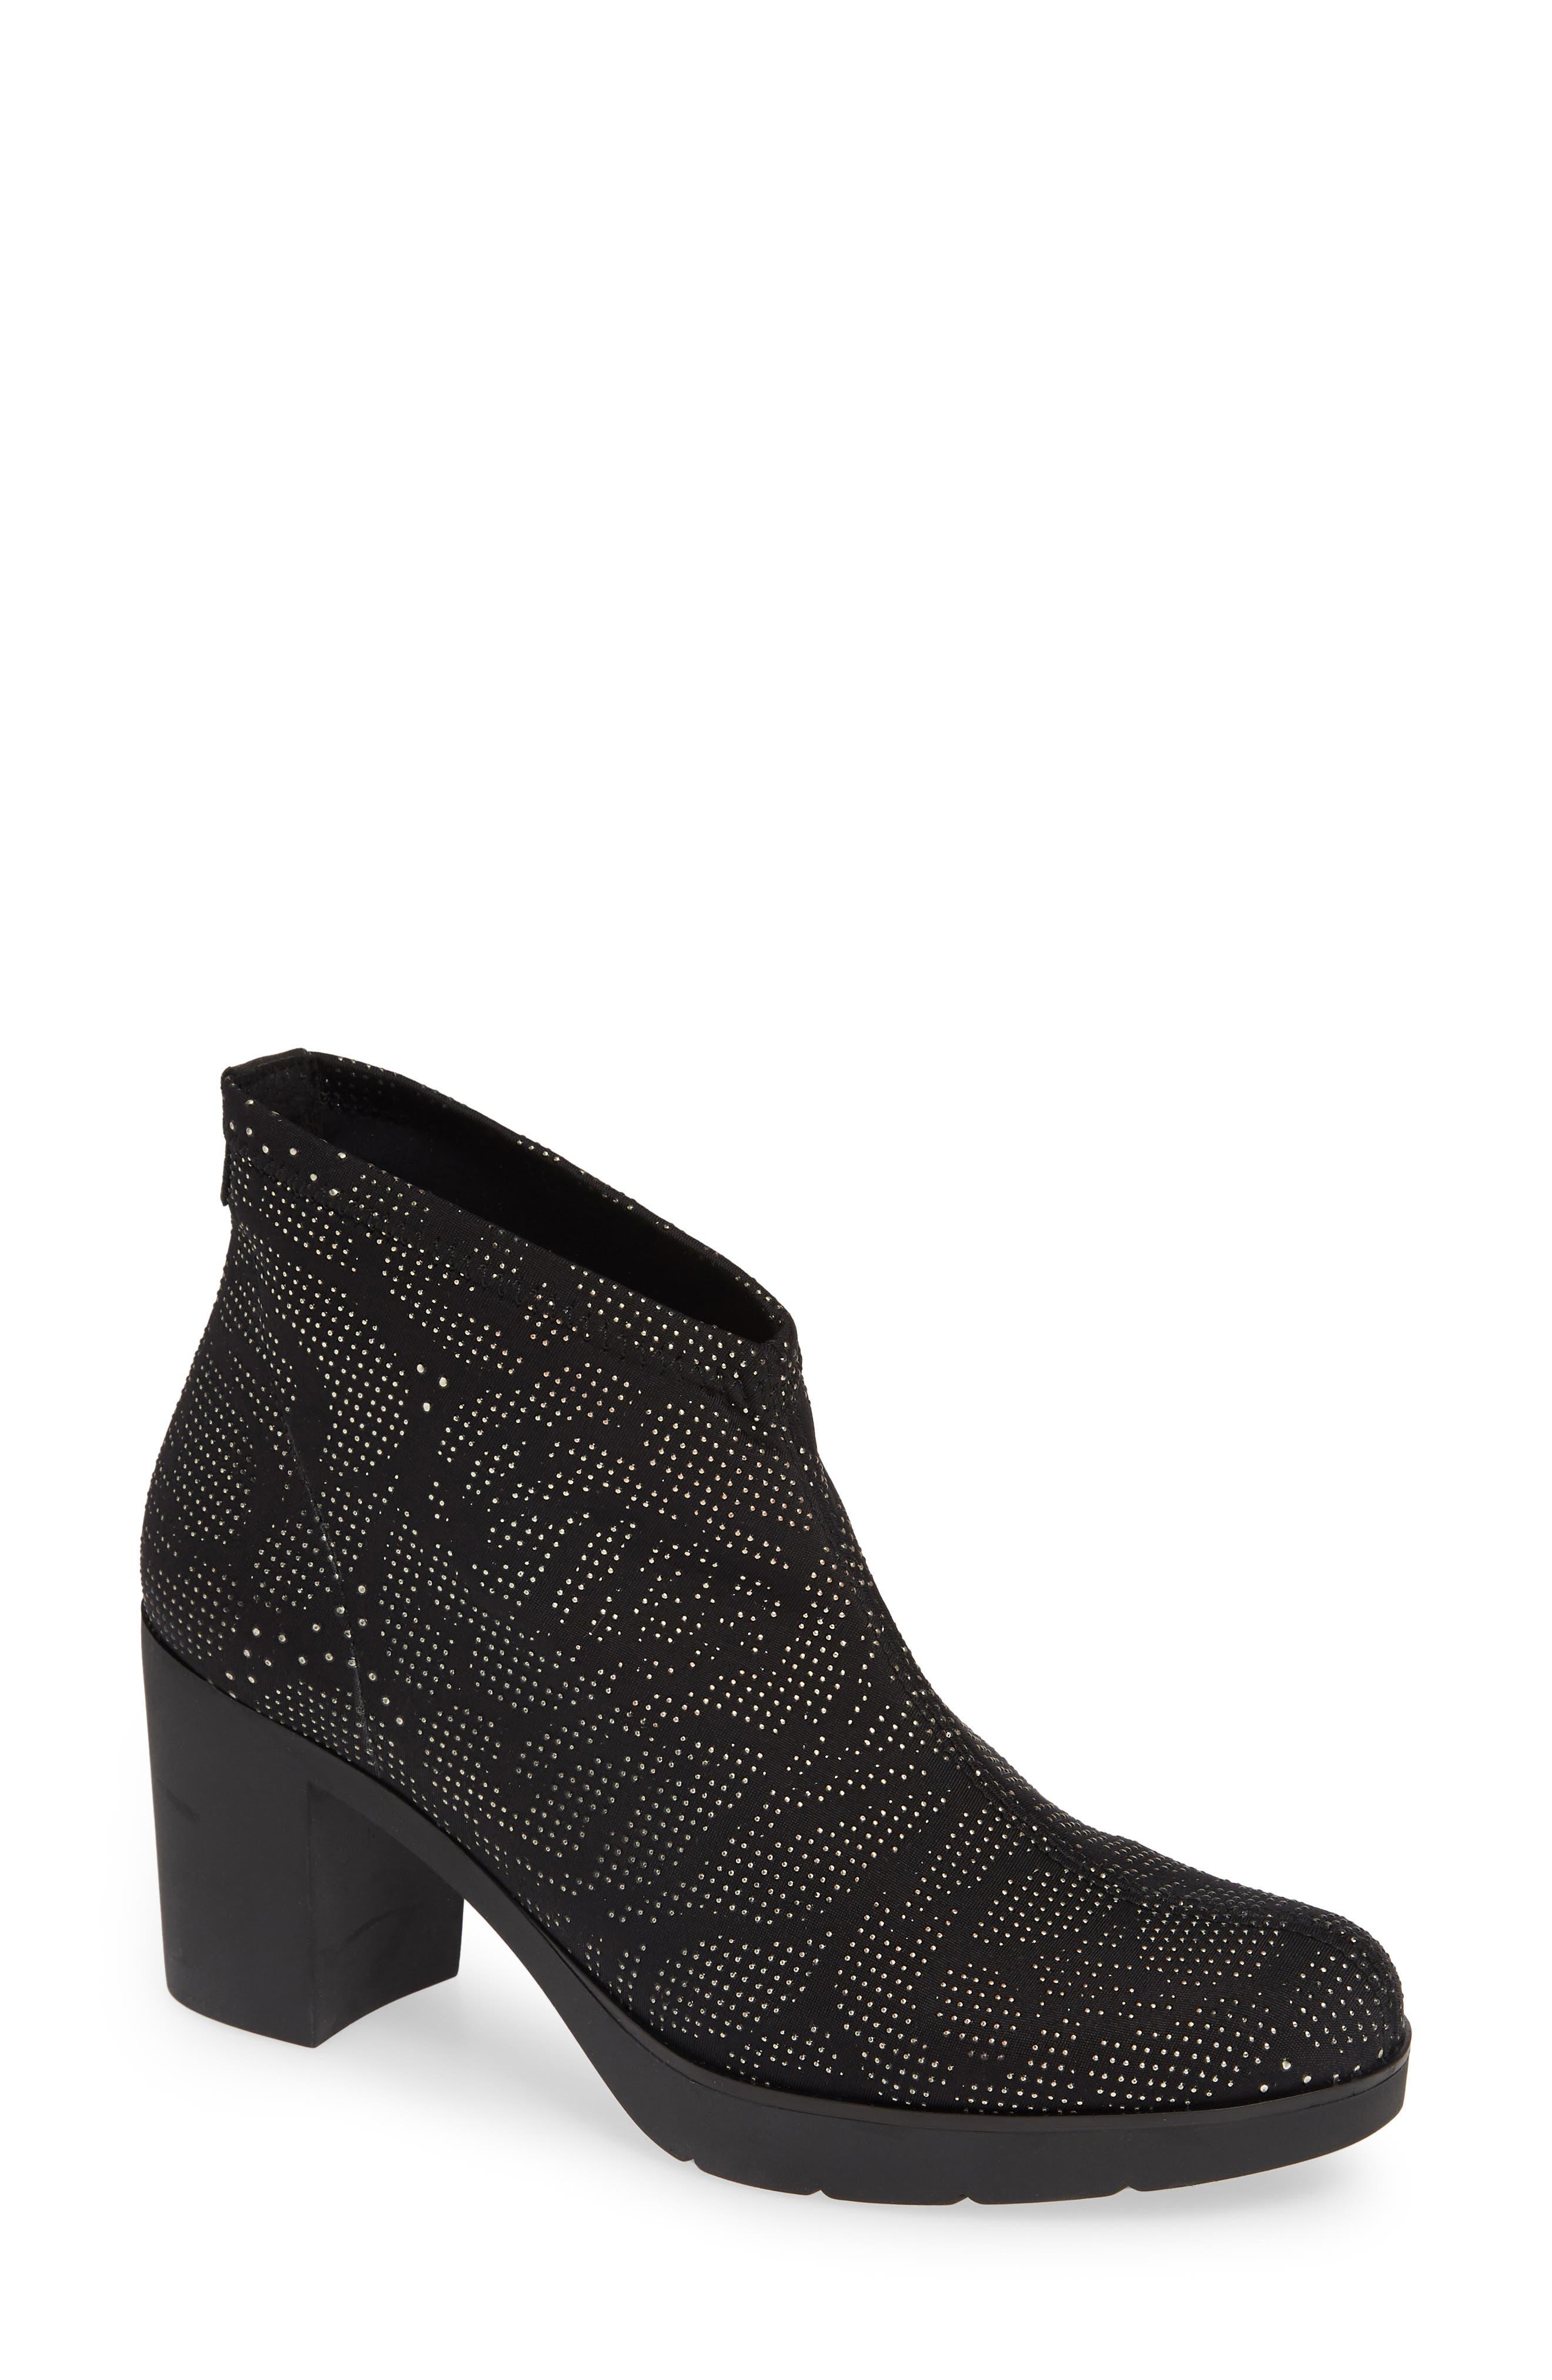 TONI PONS 'Finley' Bootie (Women) in Black Fabric